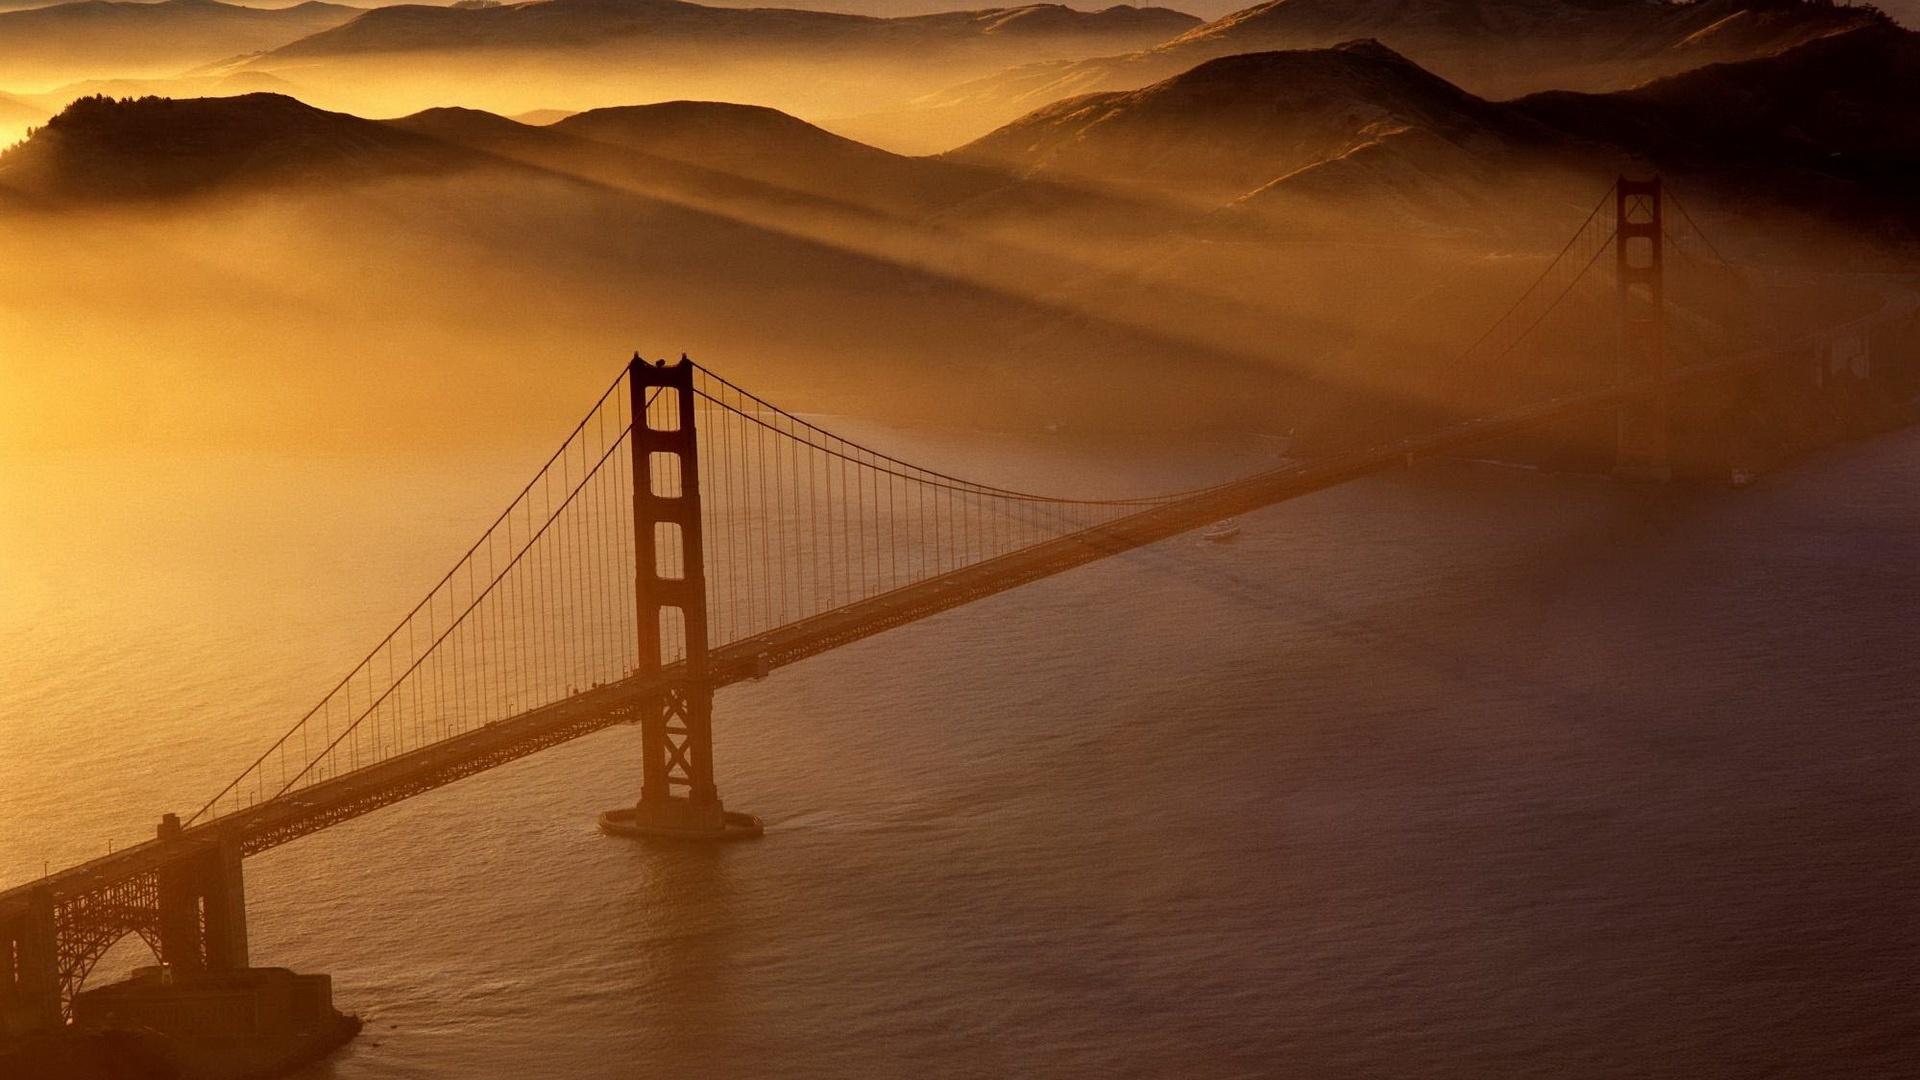 мост, лучи солнца, дымка, пролив